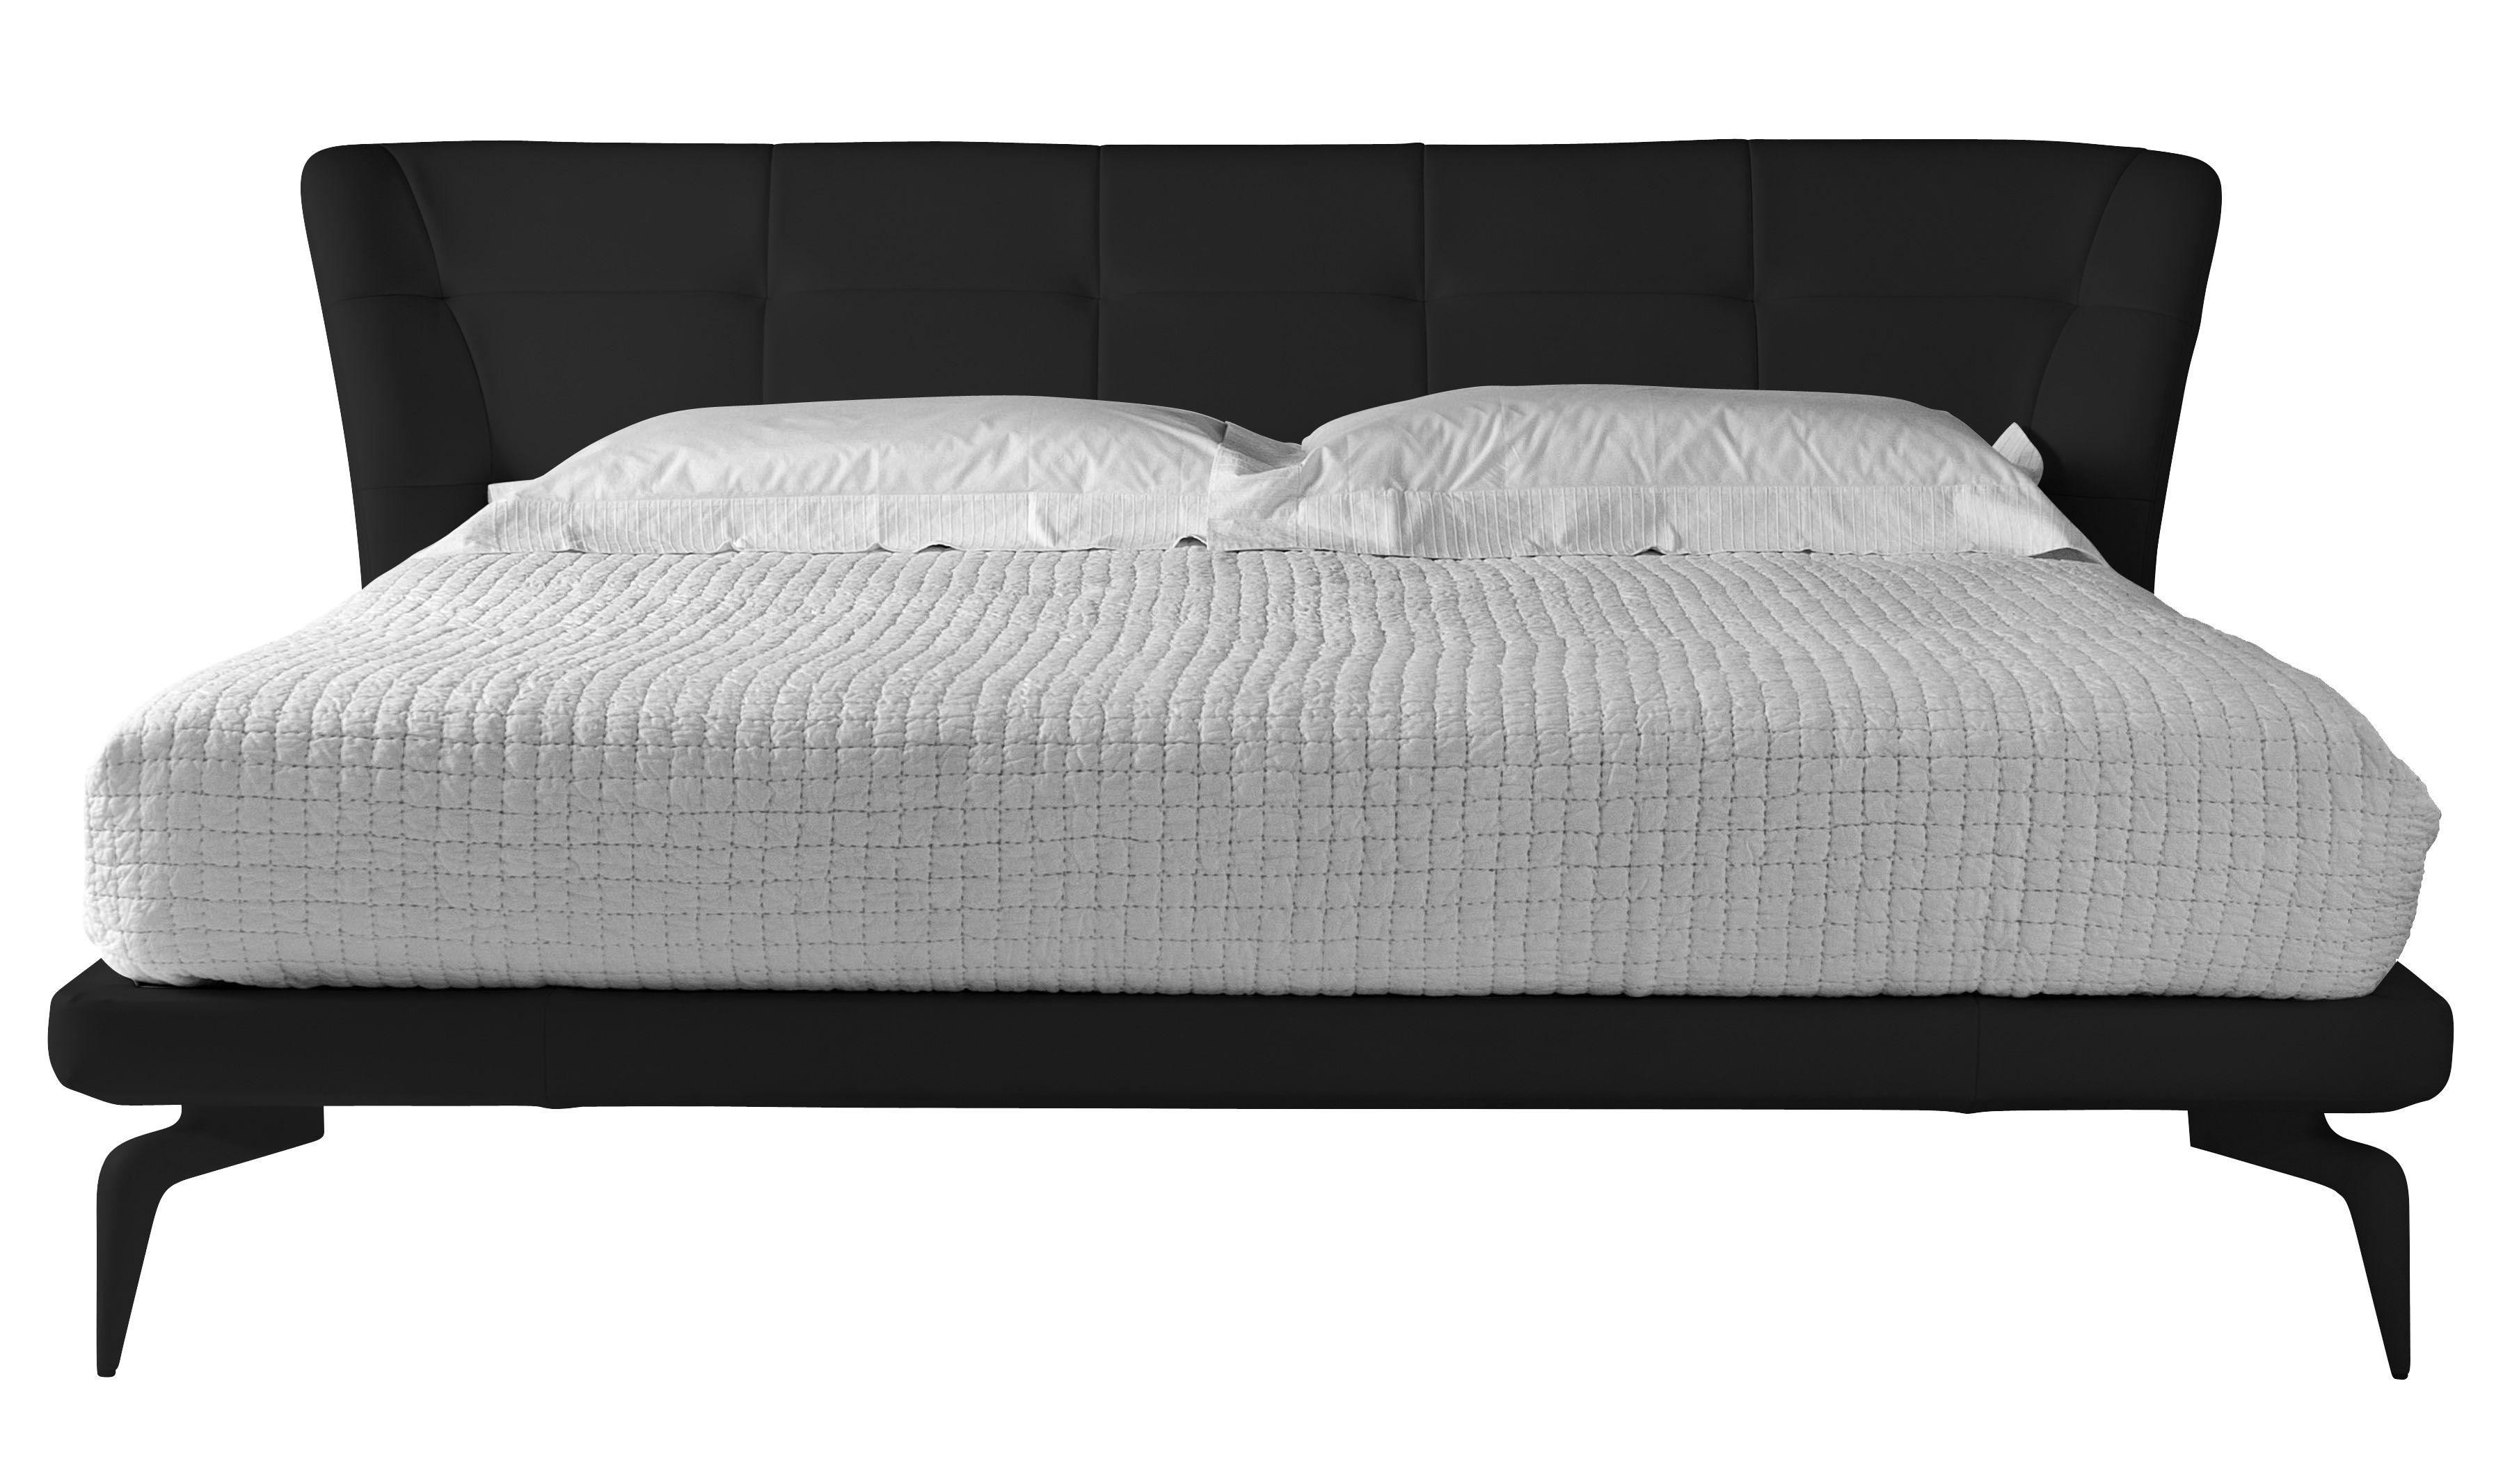 Mobilier - Lits - Lit double Leeon 221 x 222 cm - Driade - Cuir noir - Aluminium laqué, Cuir